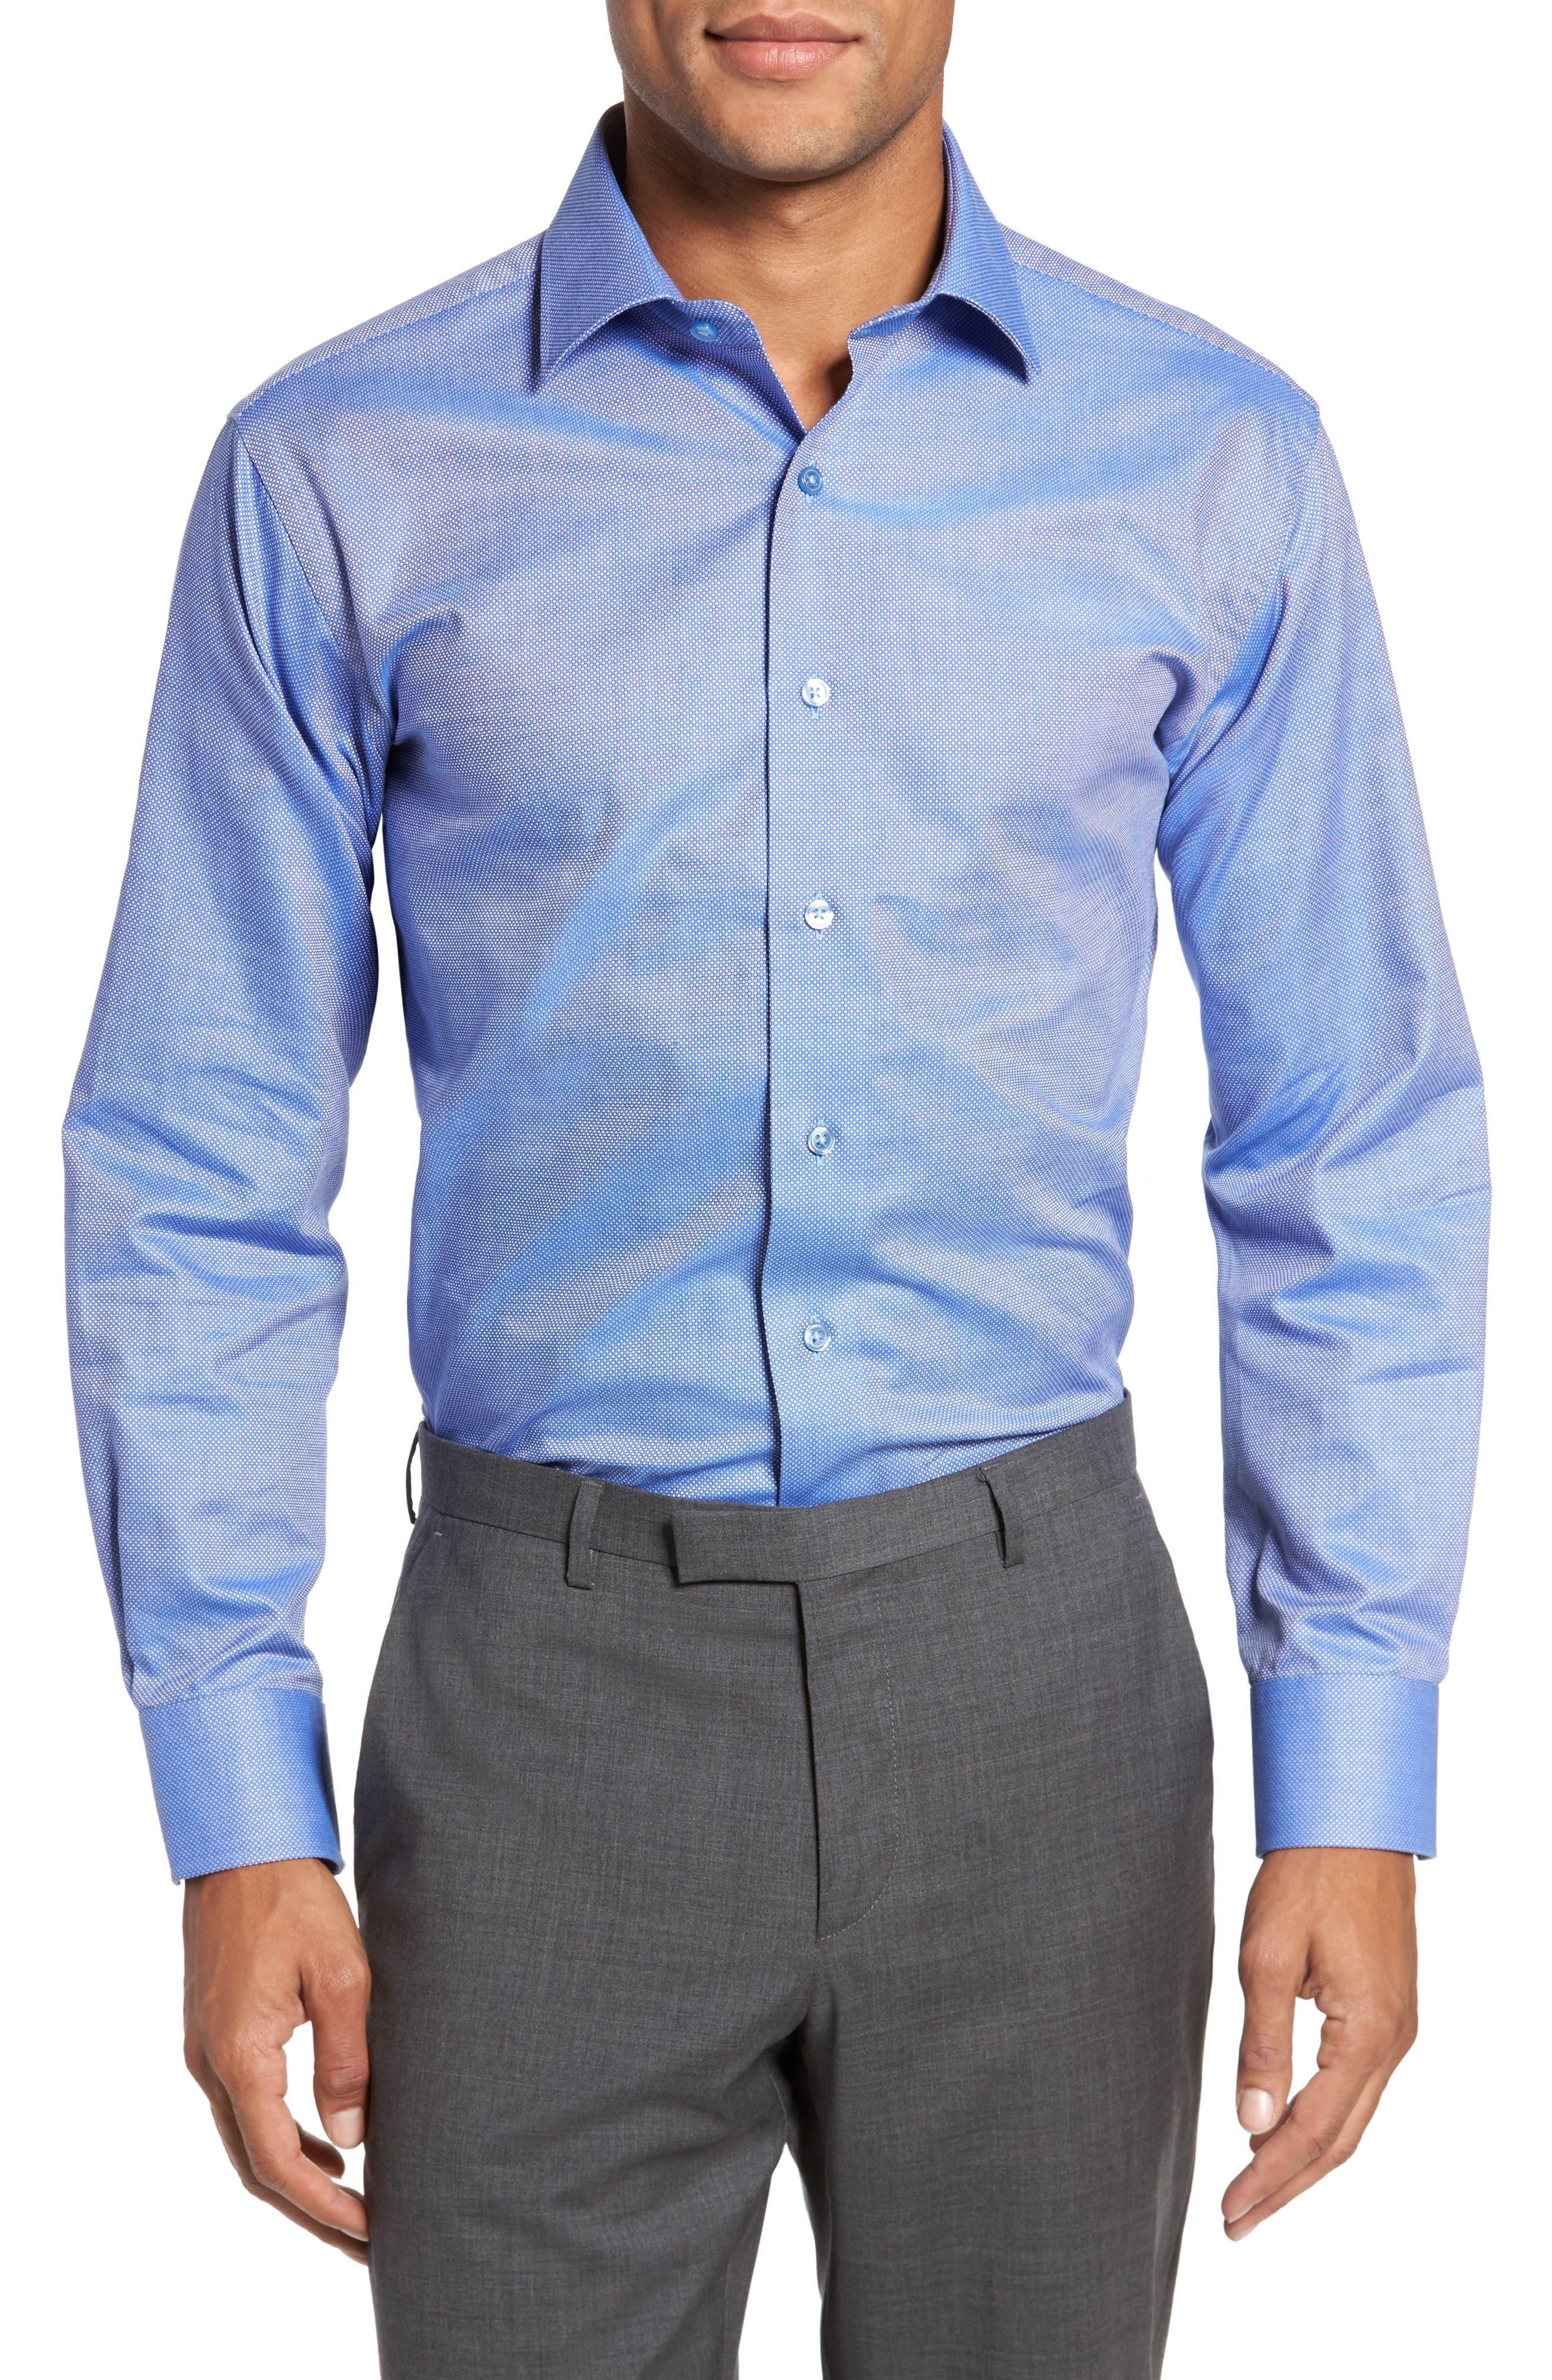 LORENZO UOMO Trim Fit Textured Dress Shirt, Main, color, NAVY